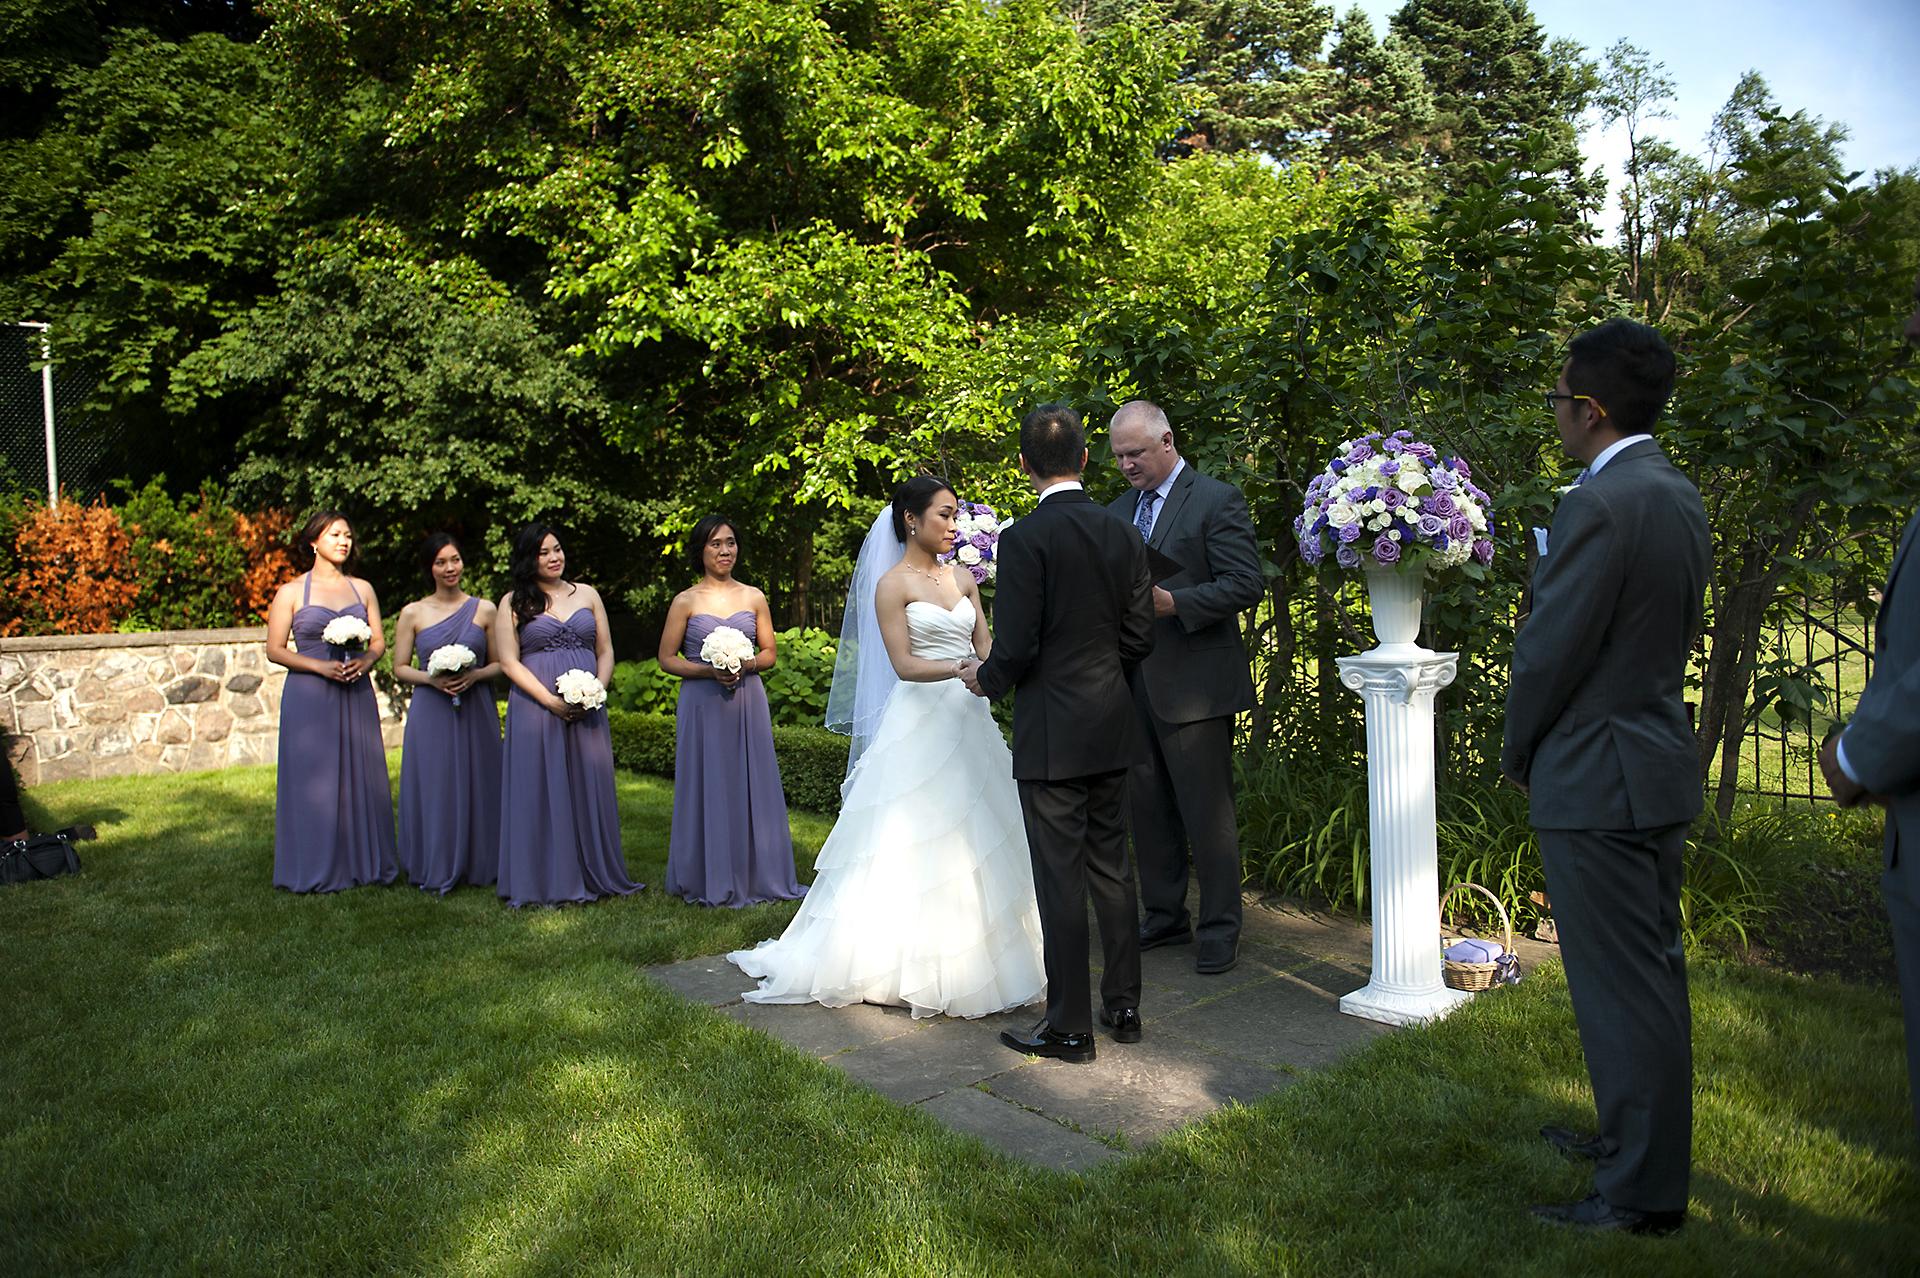 graydon_hall_manor_wedding_photography_036